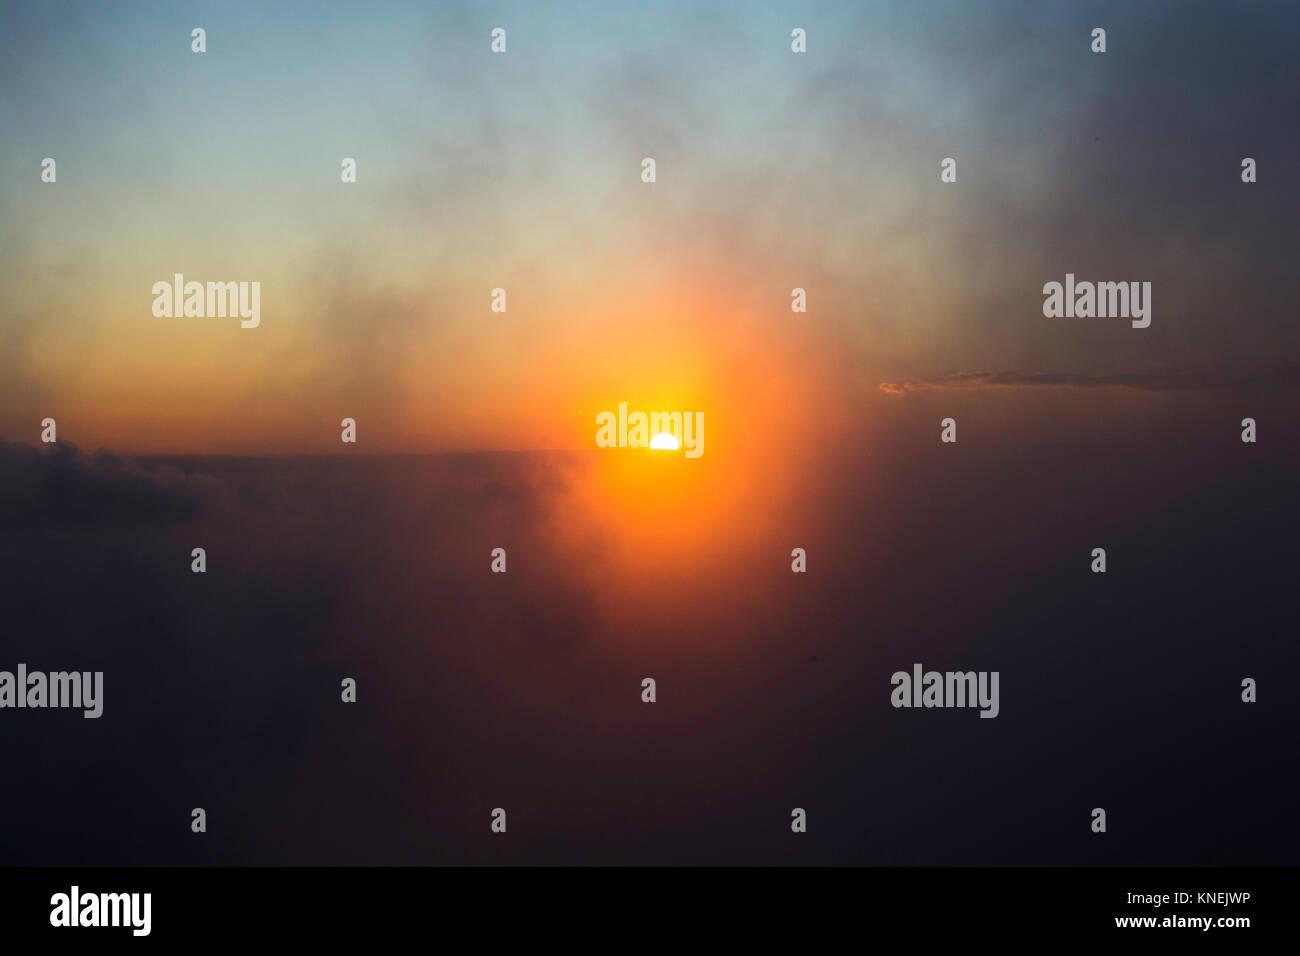 Sunset in Tà Xùa, Sơn La, Việt Nam - Stock Image